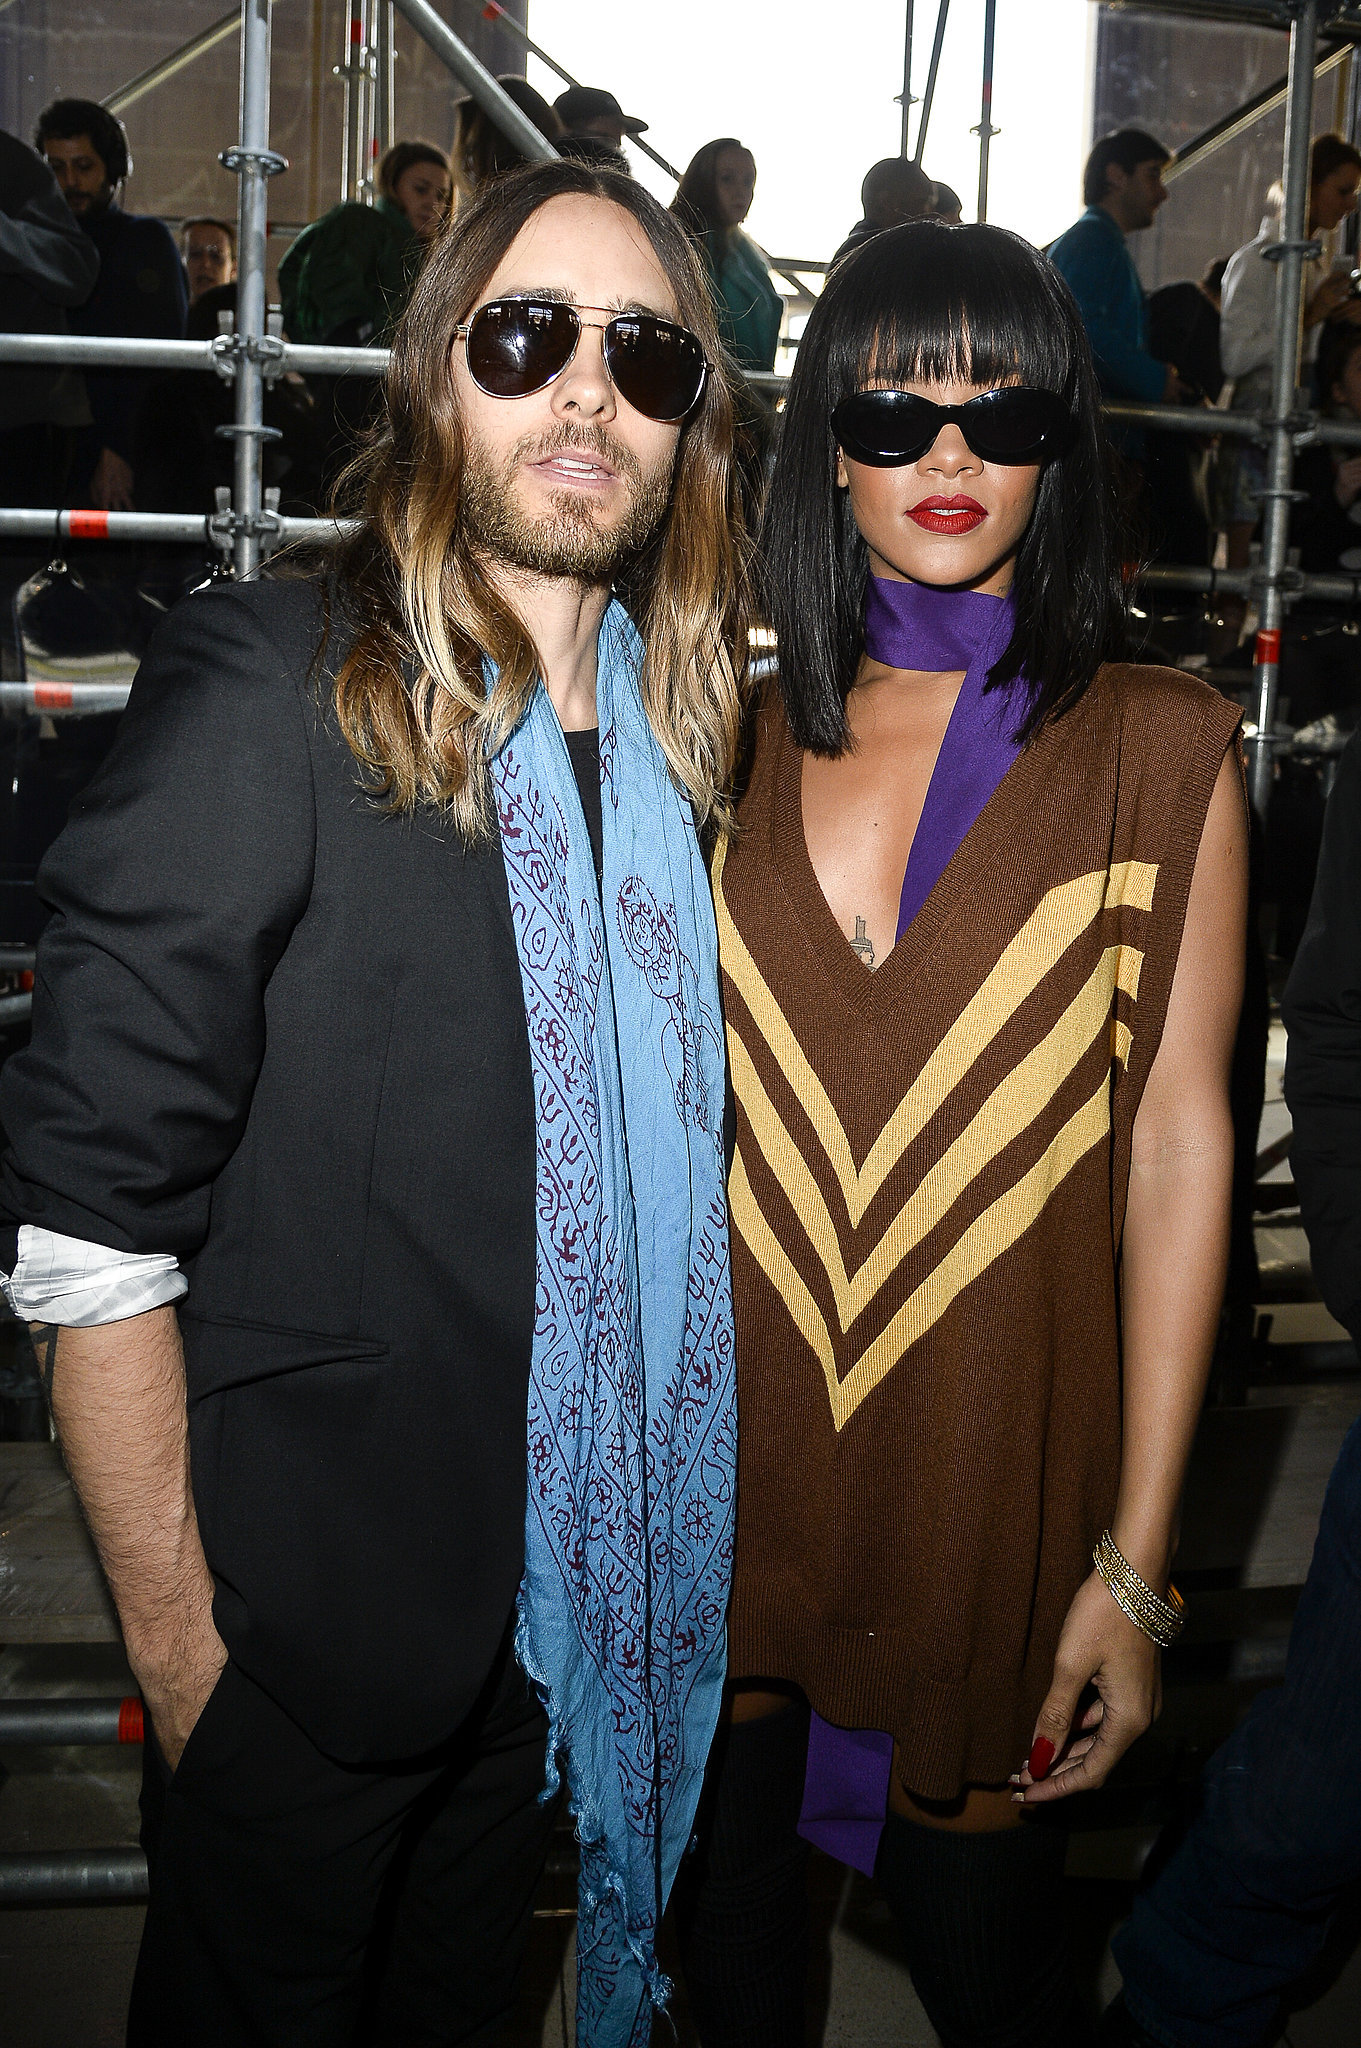 Lupita and Jared Take Their Post-Oscars Glow to Paris